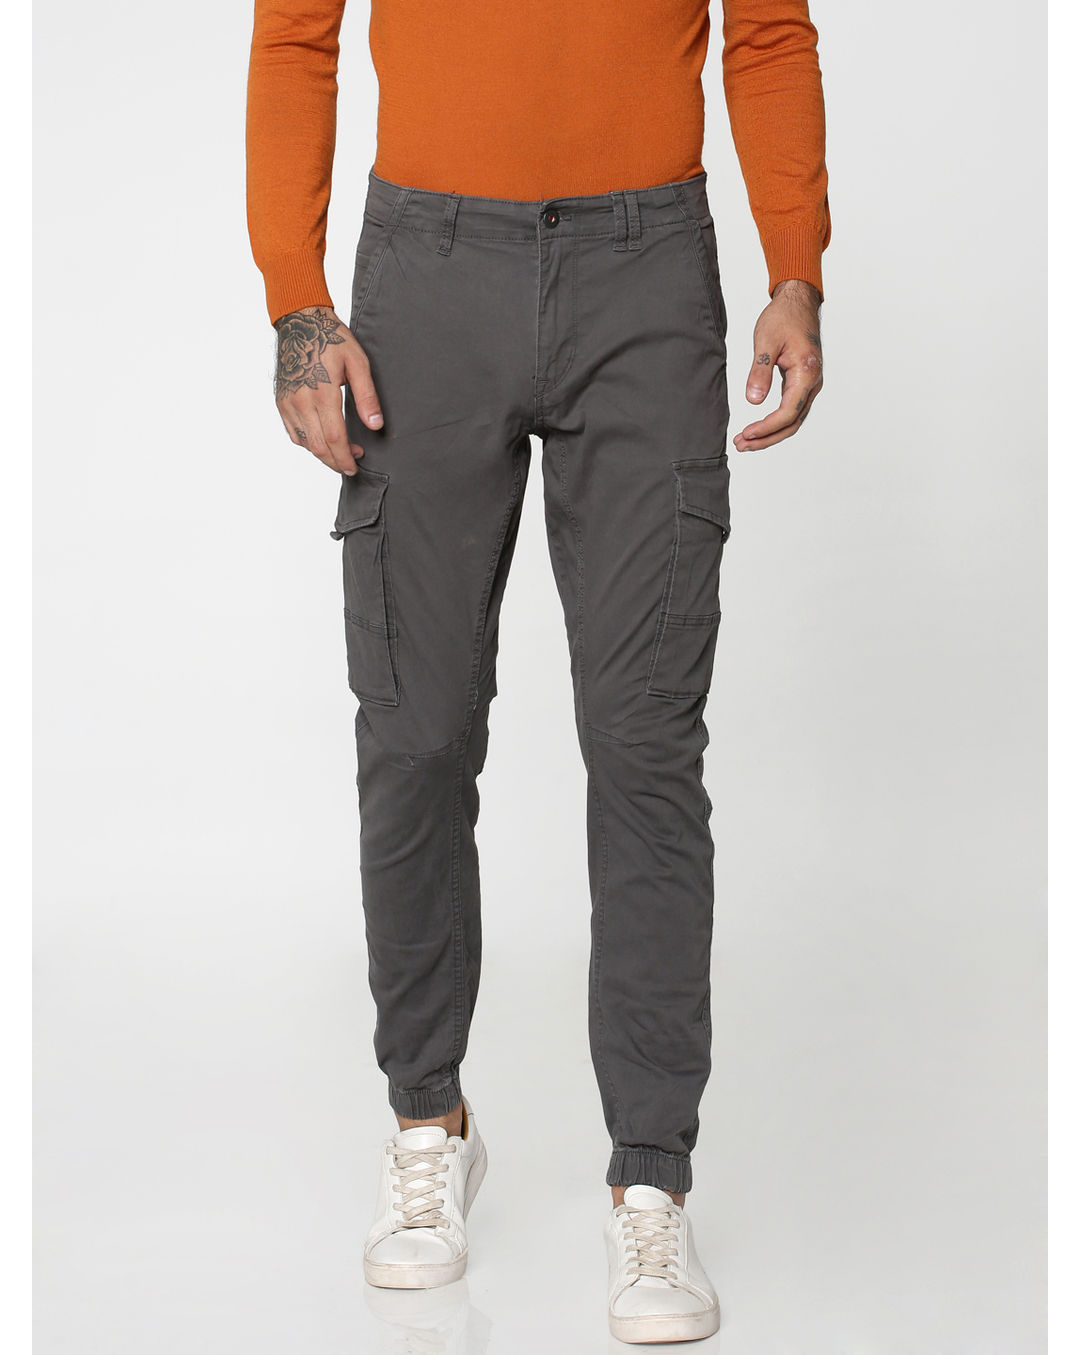 quality design 96bf7 2015f Buy Jack & Jones Grey Anti-Fit Cargo Pants Online | Jack & Jones